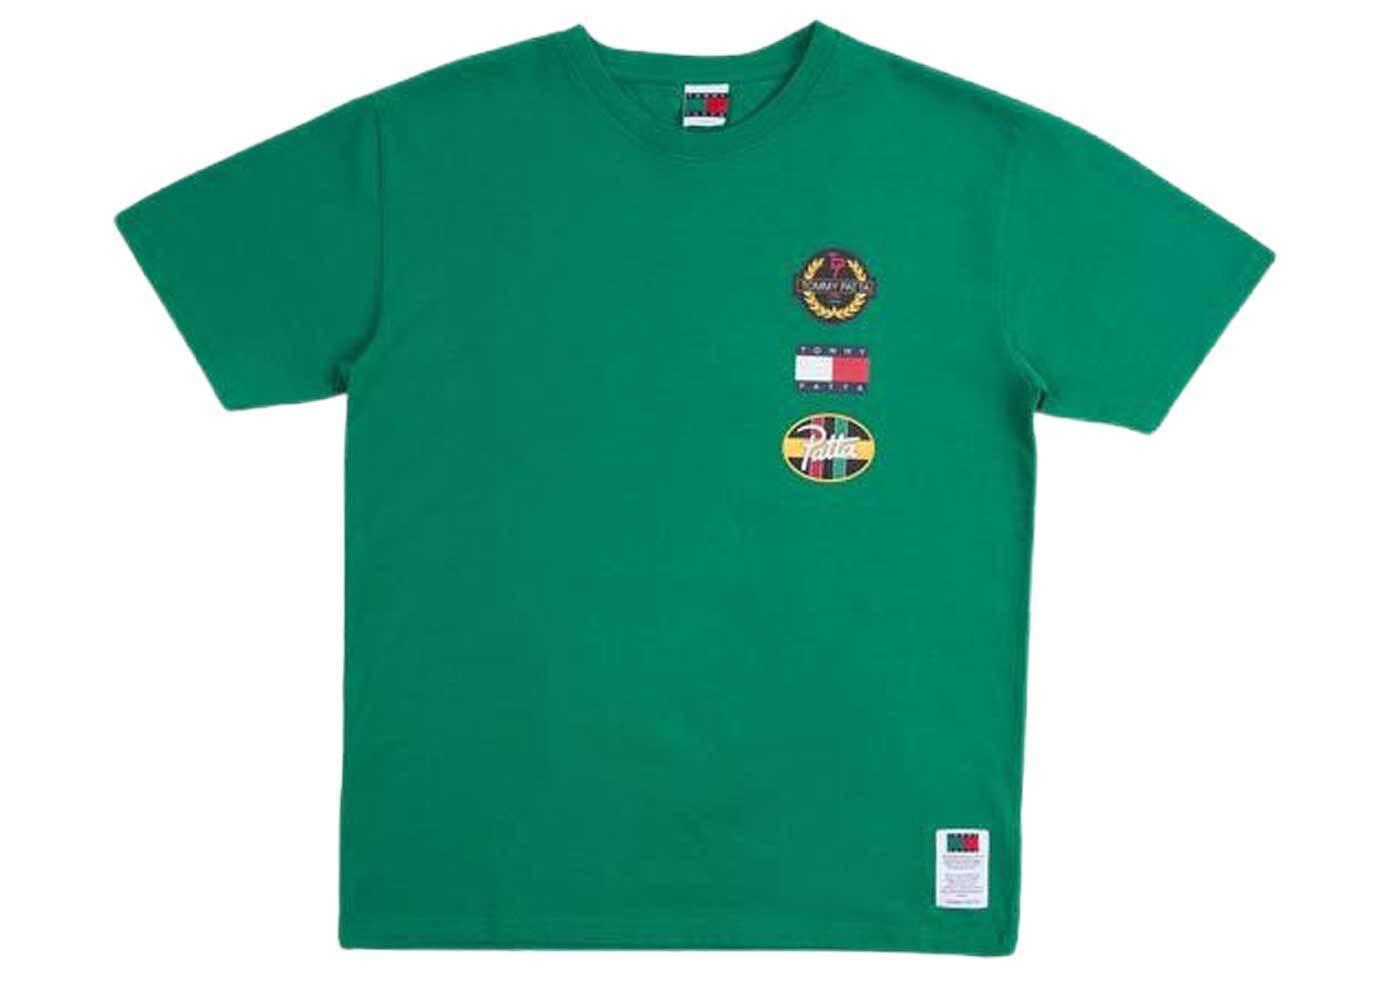 Patta × Tommy Flag T Shirt Jelly Bean (SS21)の写真